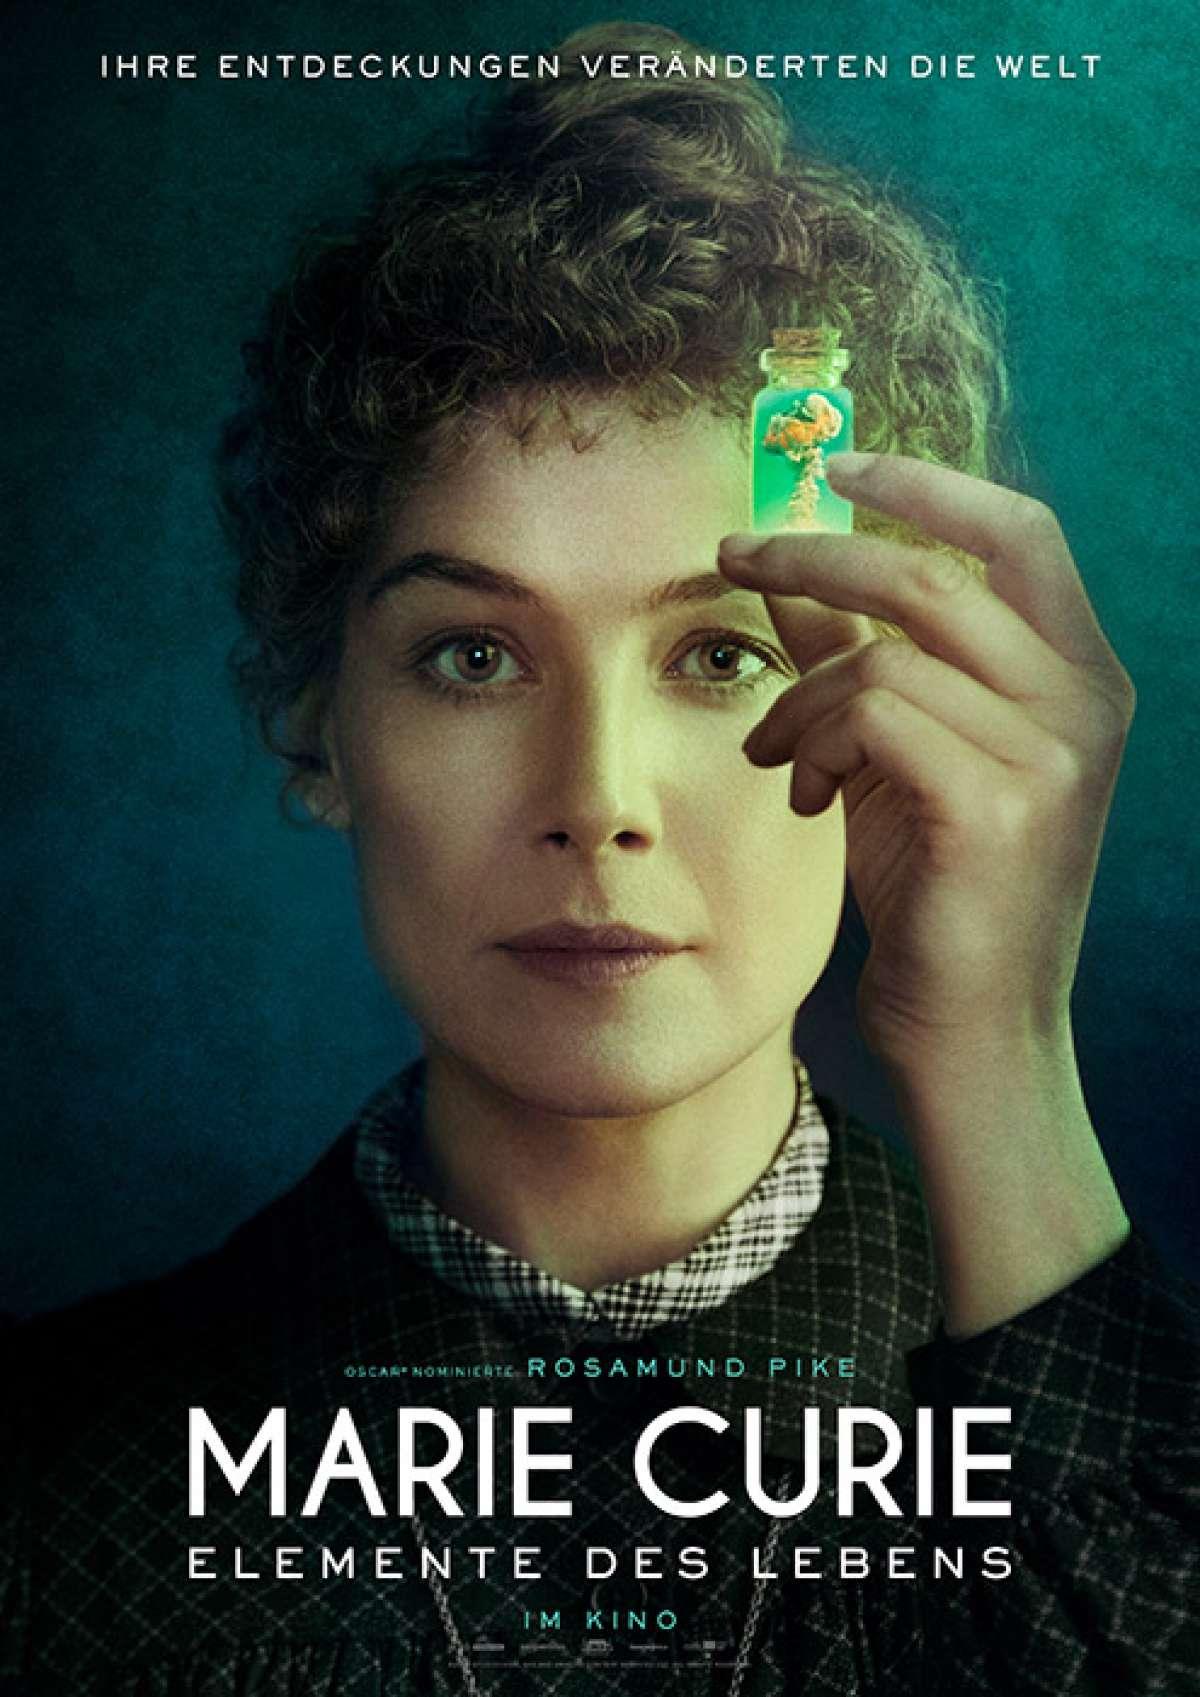 Marie Curie - Elemente des Lebens - Cineplex  - Paderborn